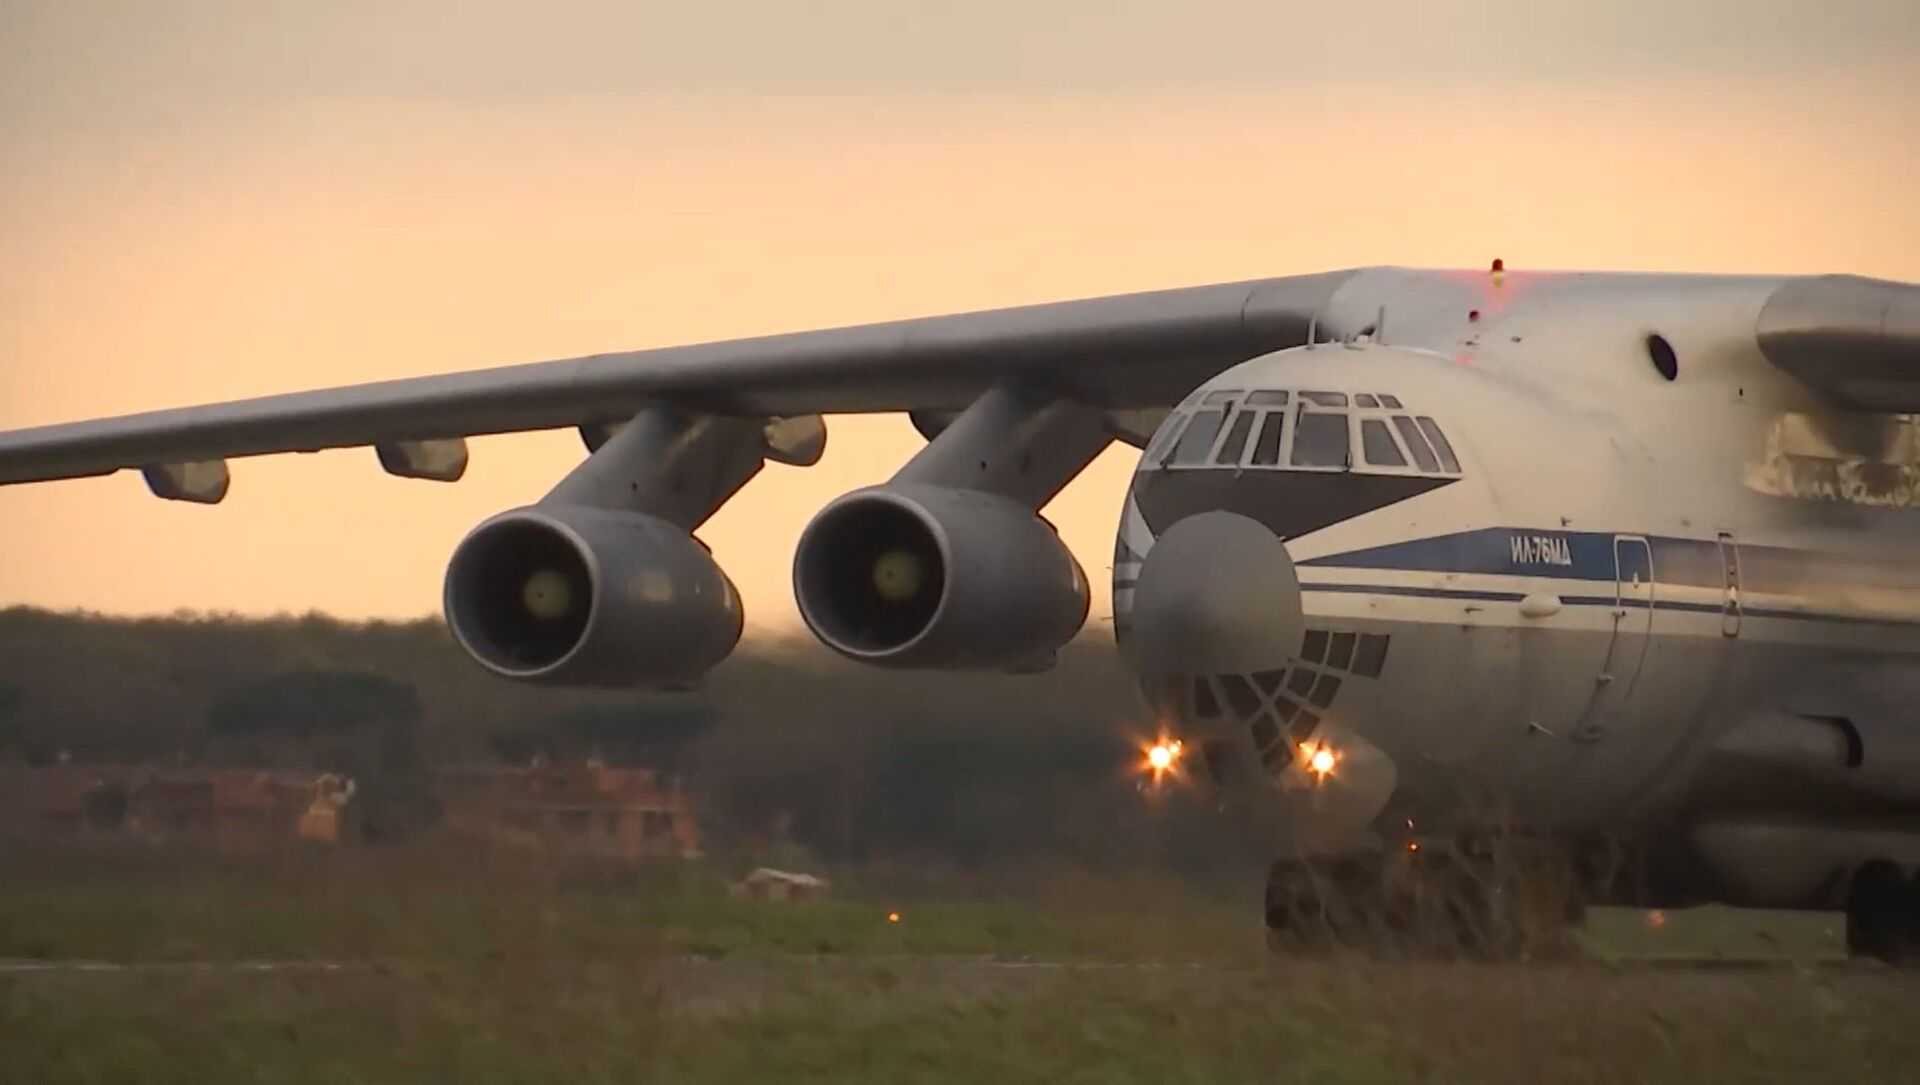 Un avión militar ruso Il-76  - Sputnik Mundo, 1920, 09.02.2021